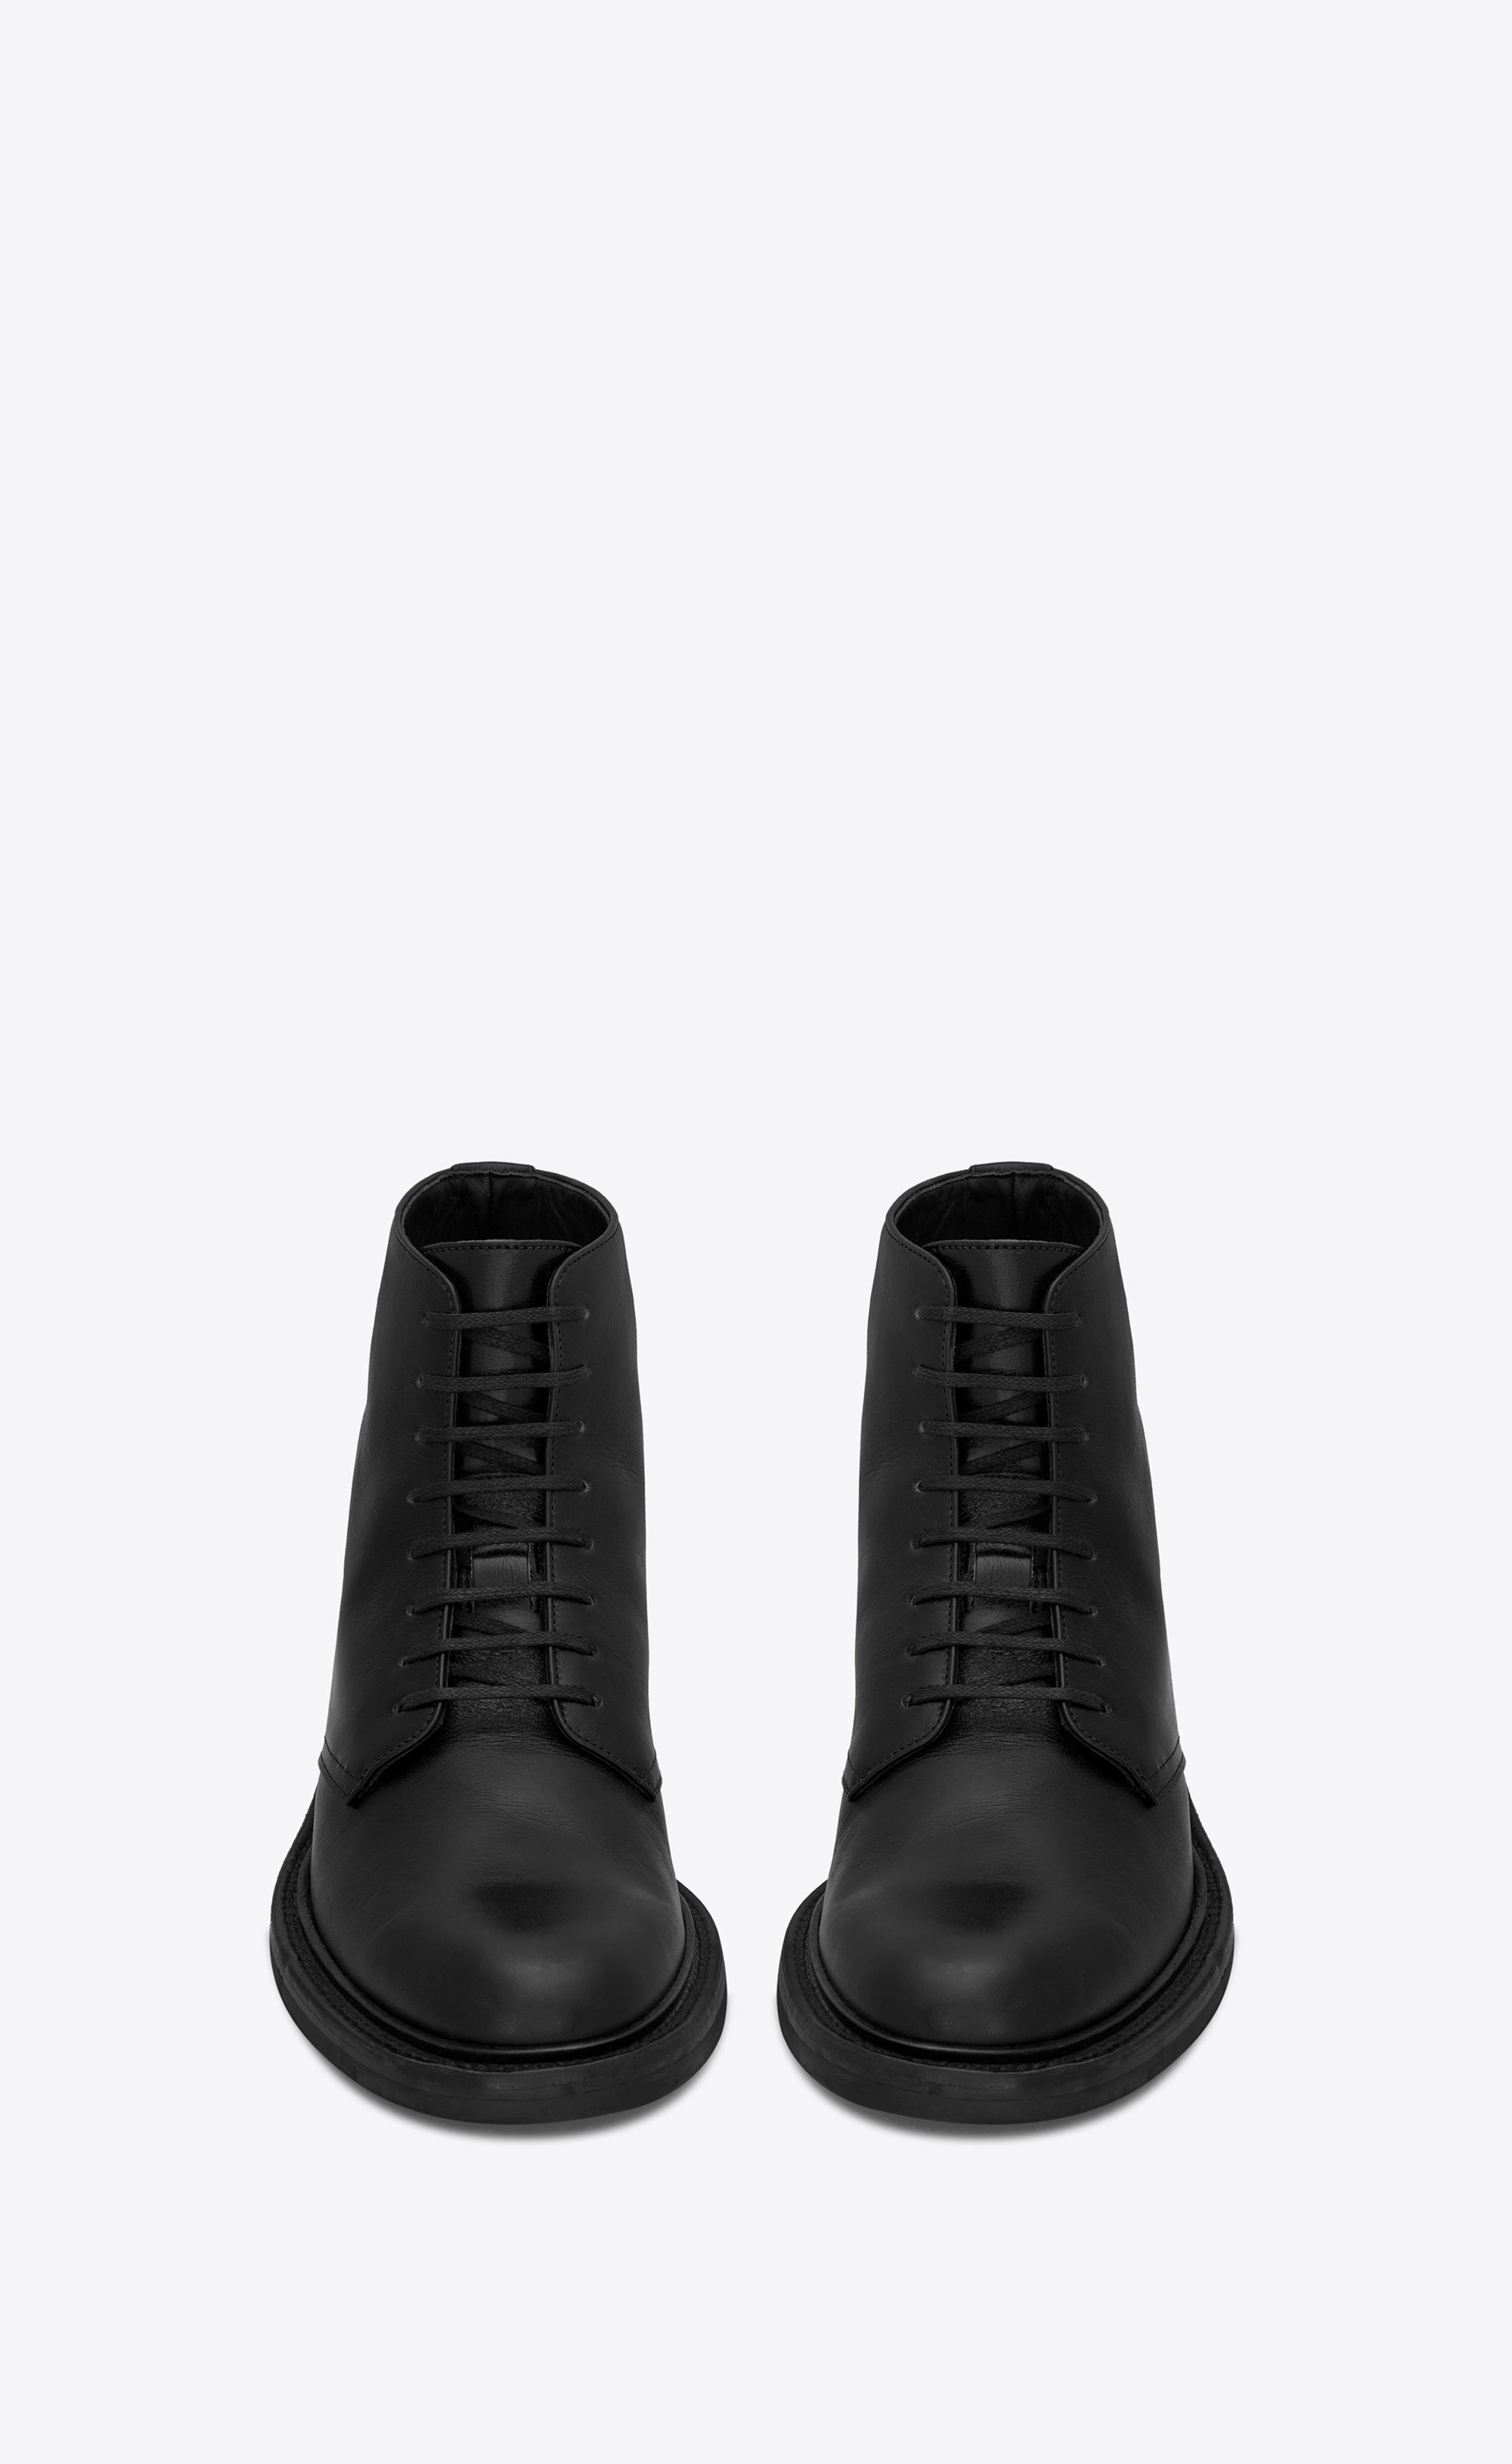 1bec07b8fa3 Saint Laurent - Black Army Boots - Lyst. View fullscreen